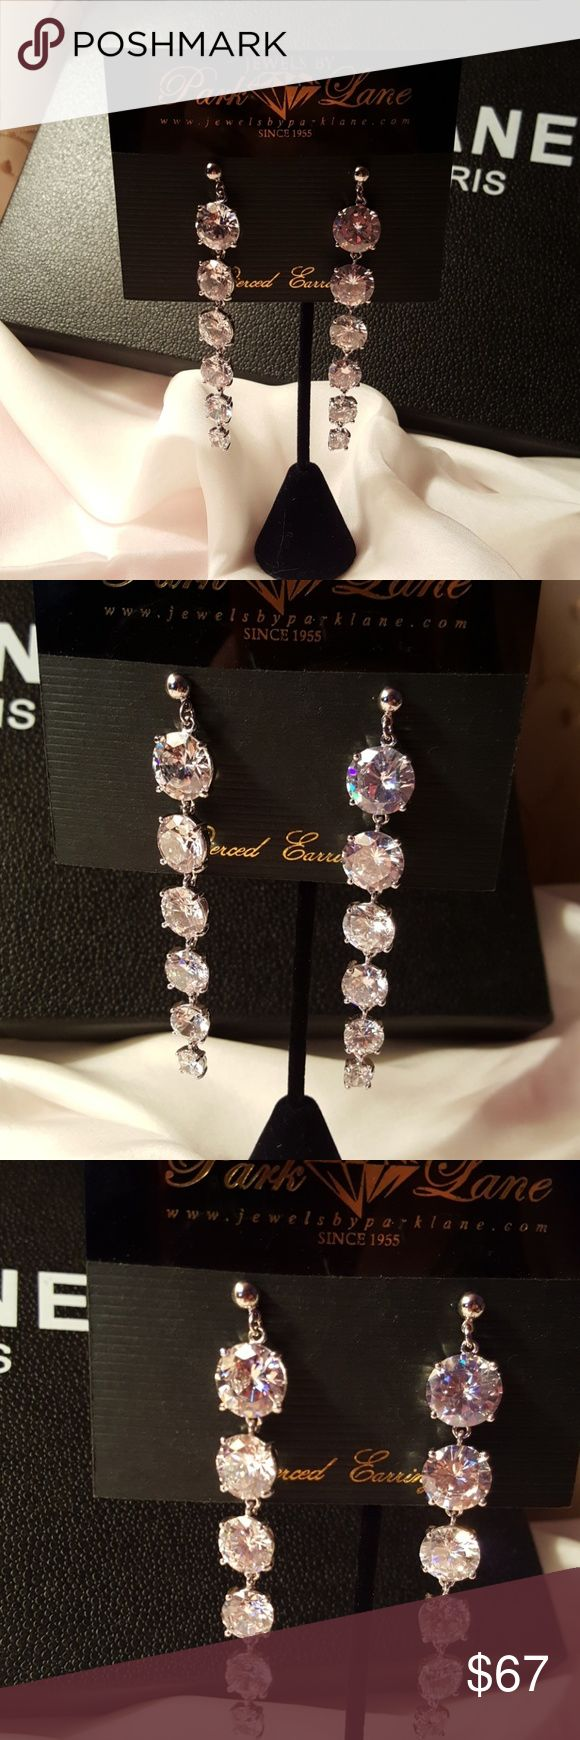 Park lane Kimberly CZ's earrings Kimberly  CZ's earrings Park Lane Jewelry Earrings